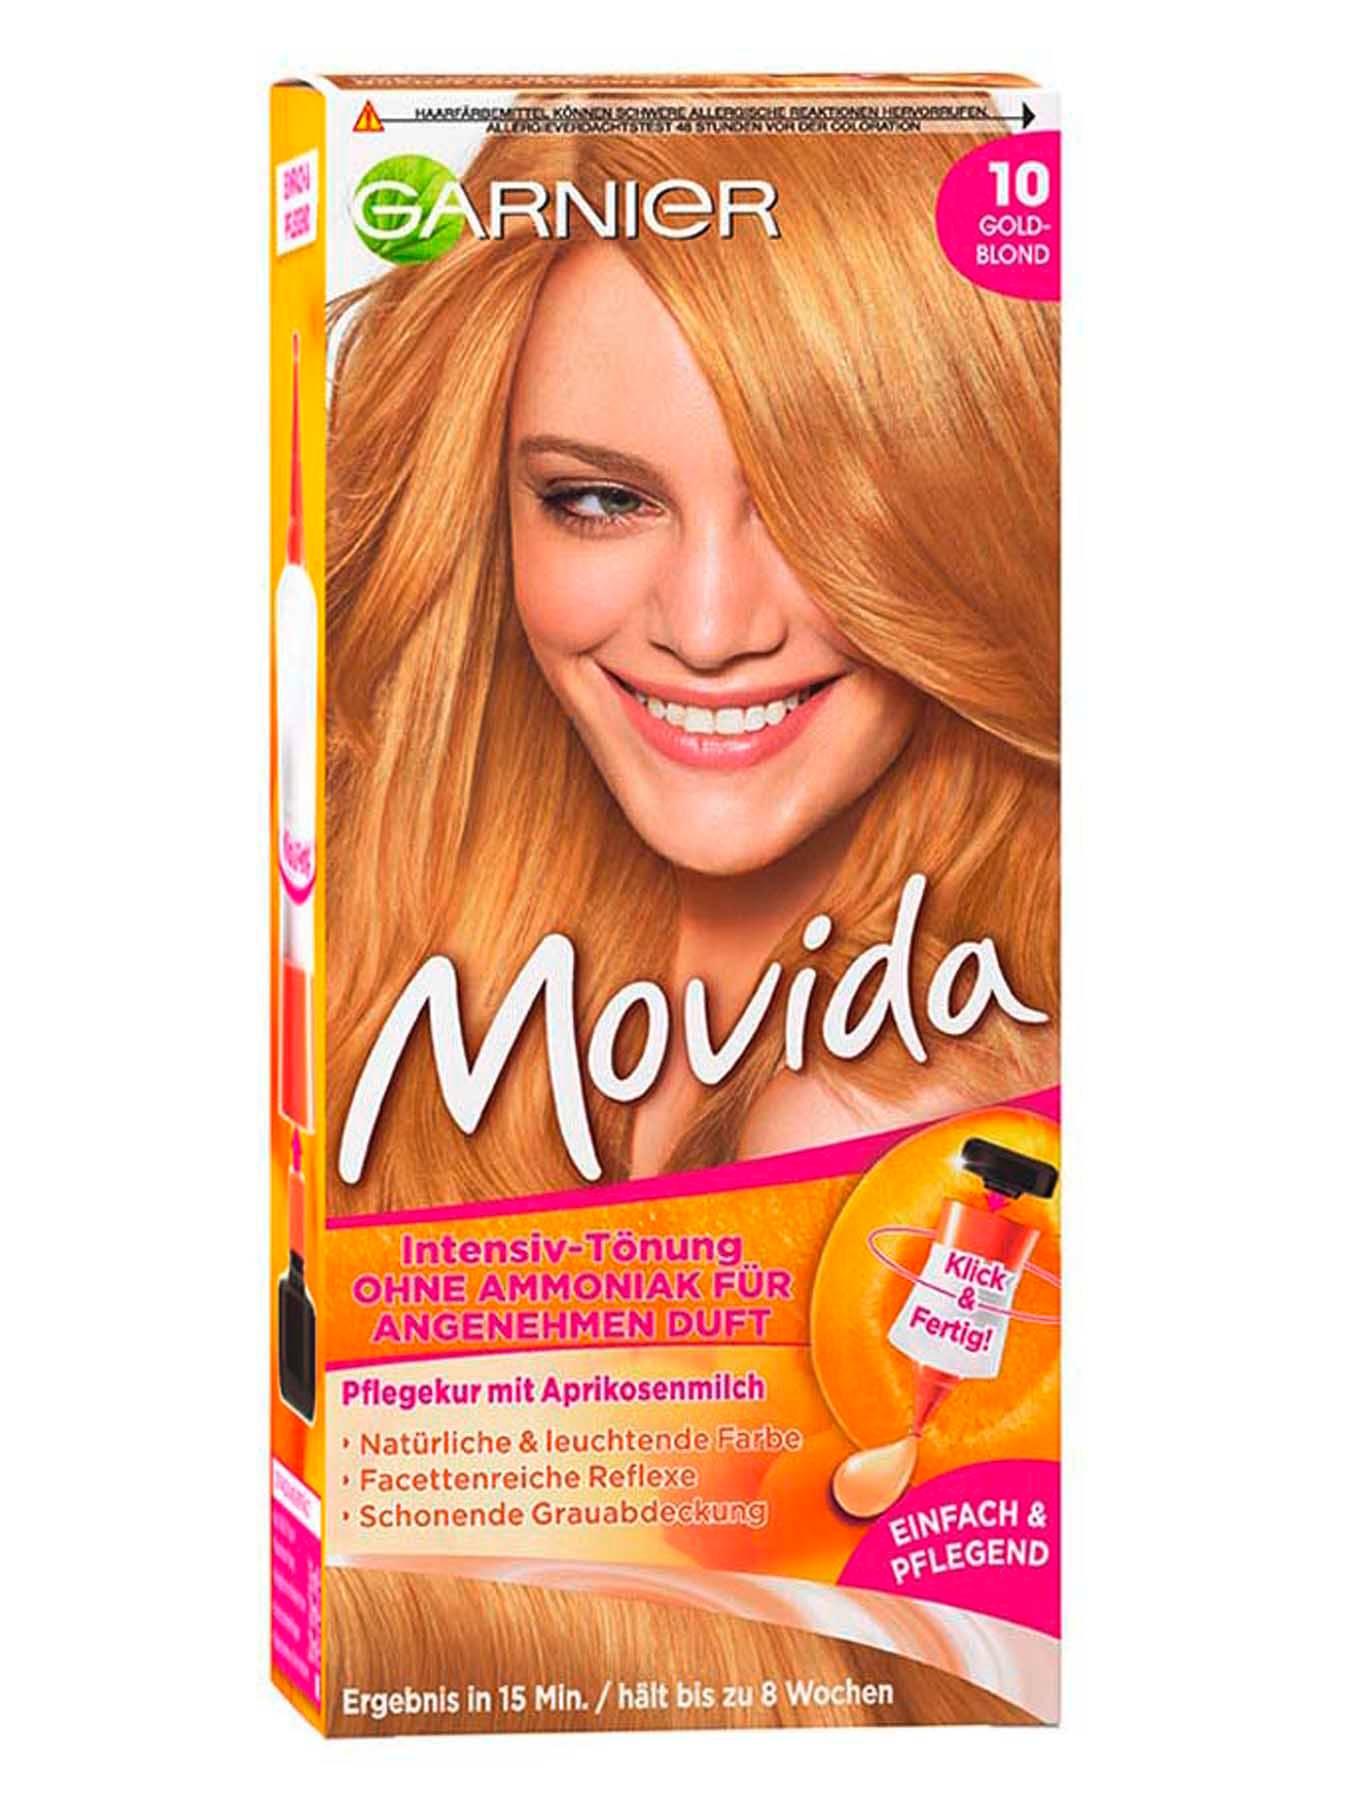 Haarfarbe blond ohne amoniak